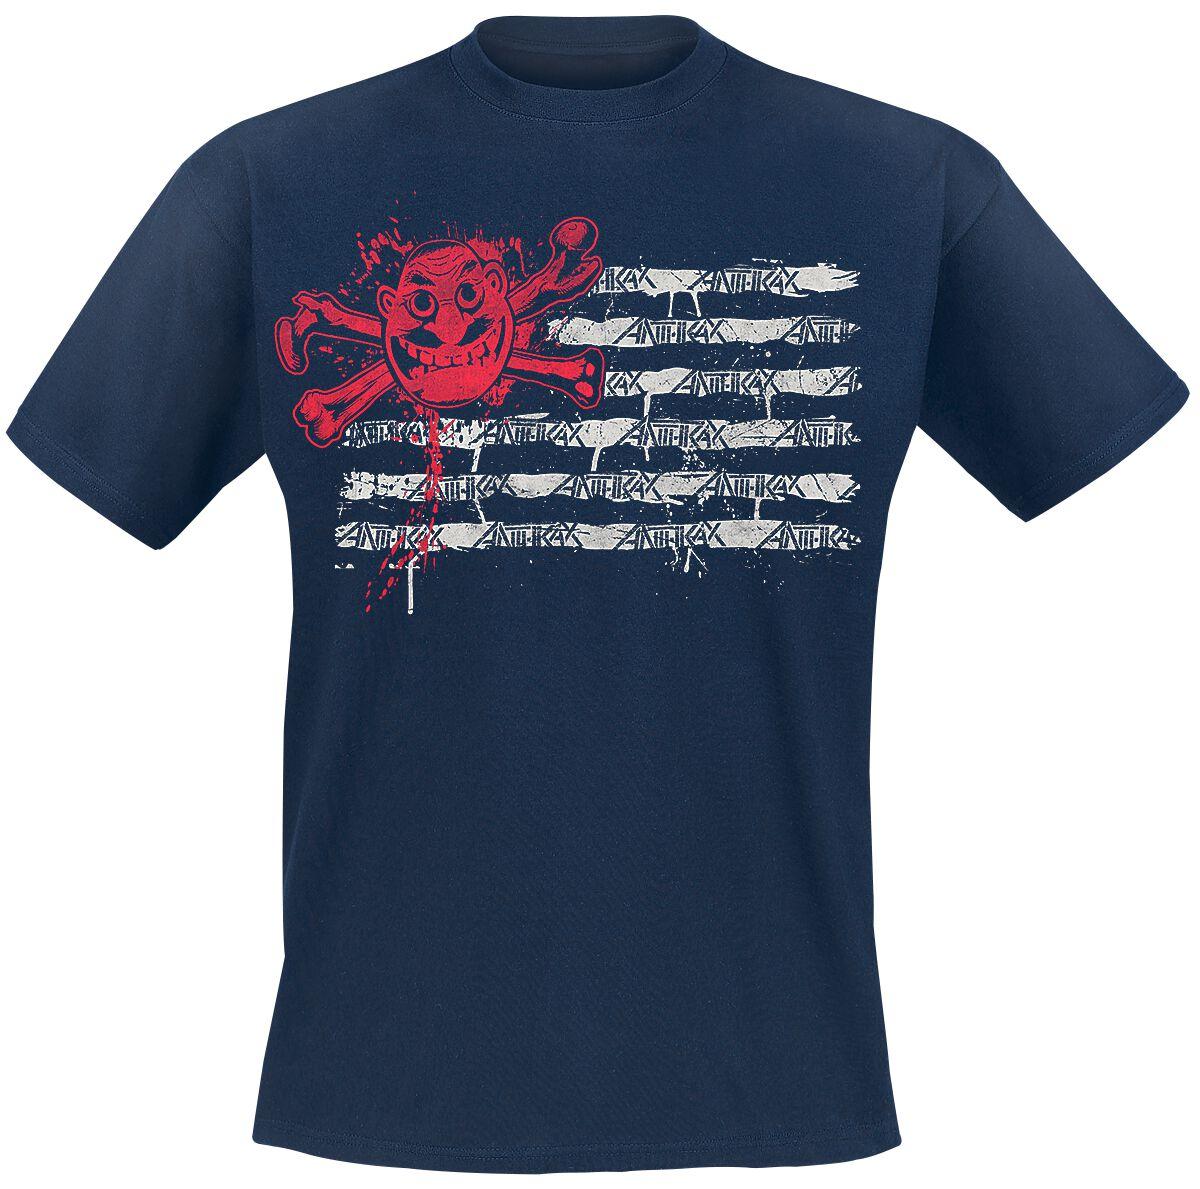 Image of Anthrax Grunge Flag T-Shirt dunkelblau